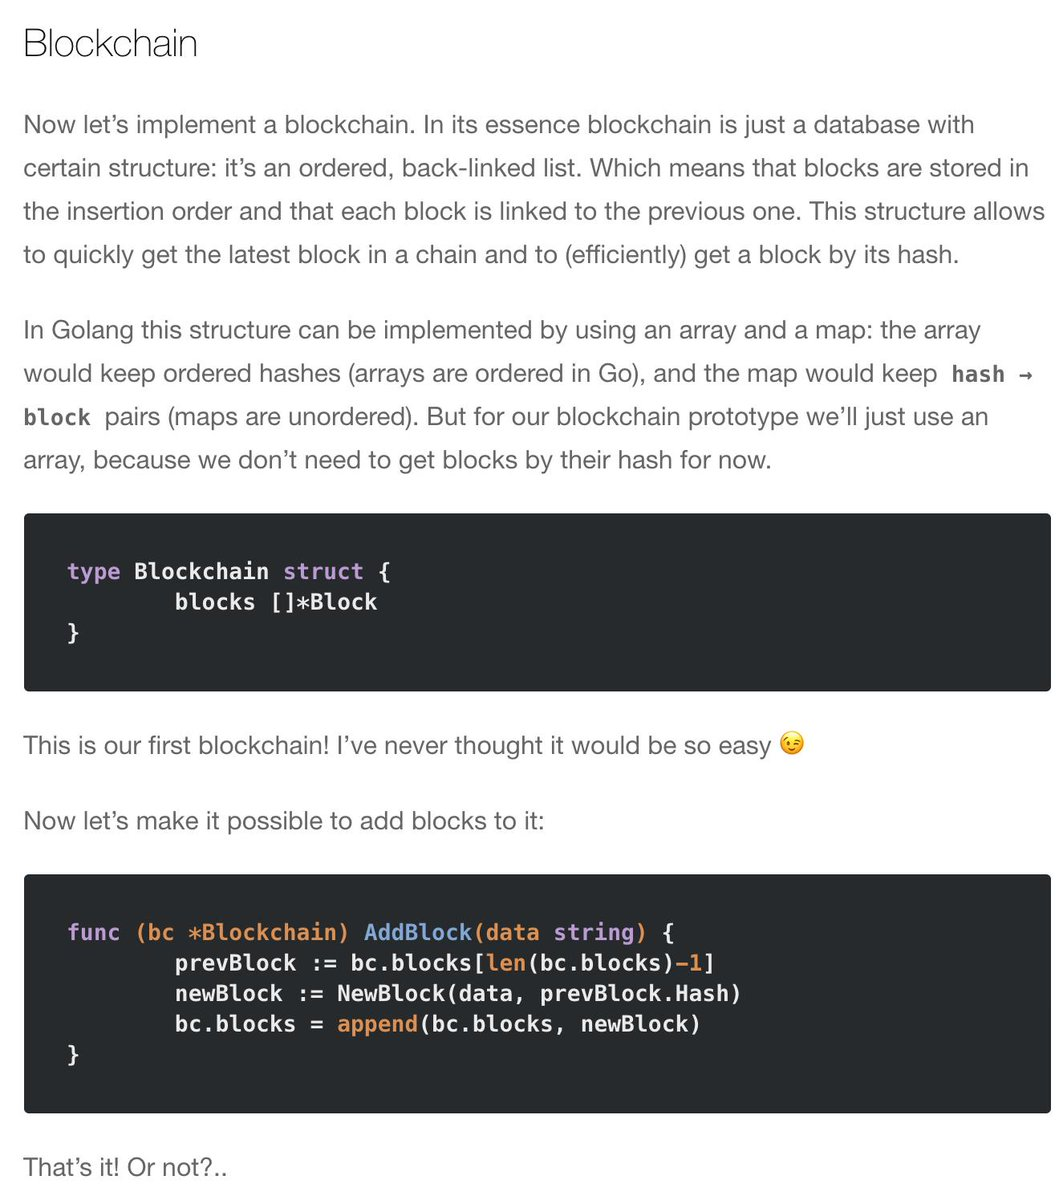 db24b3cad السورس كود كامل: https://github.com/Jeiwan/blockchain_go …pic.twitter .com/g387JcDEI0